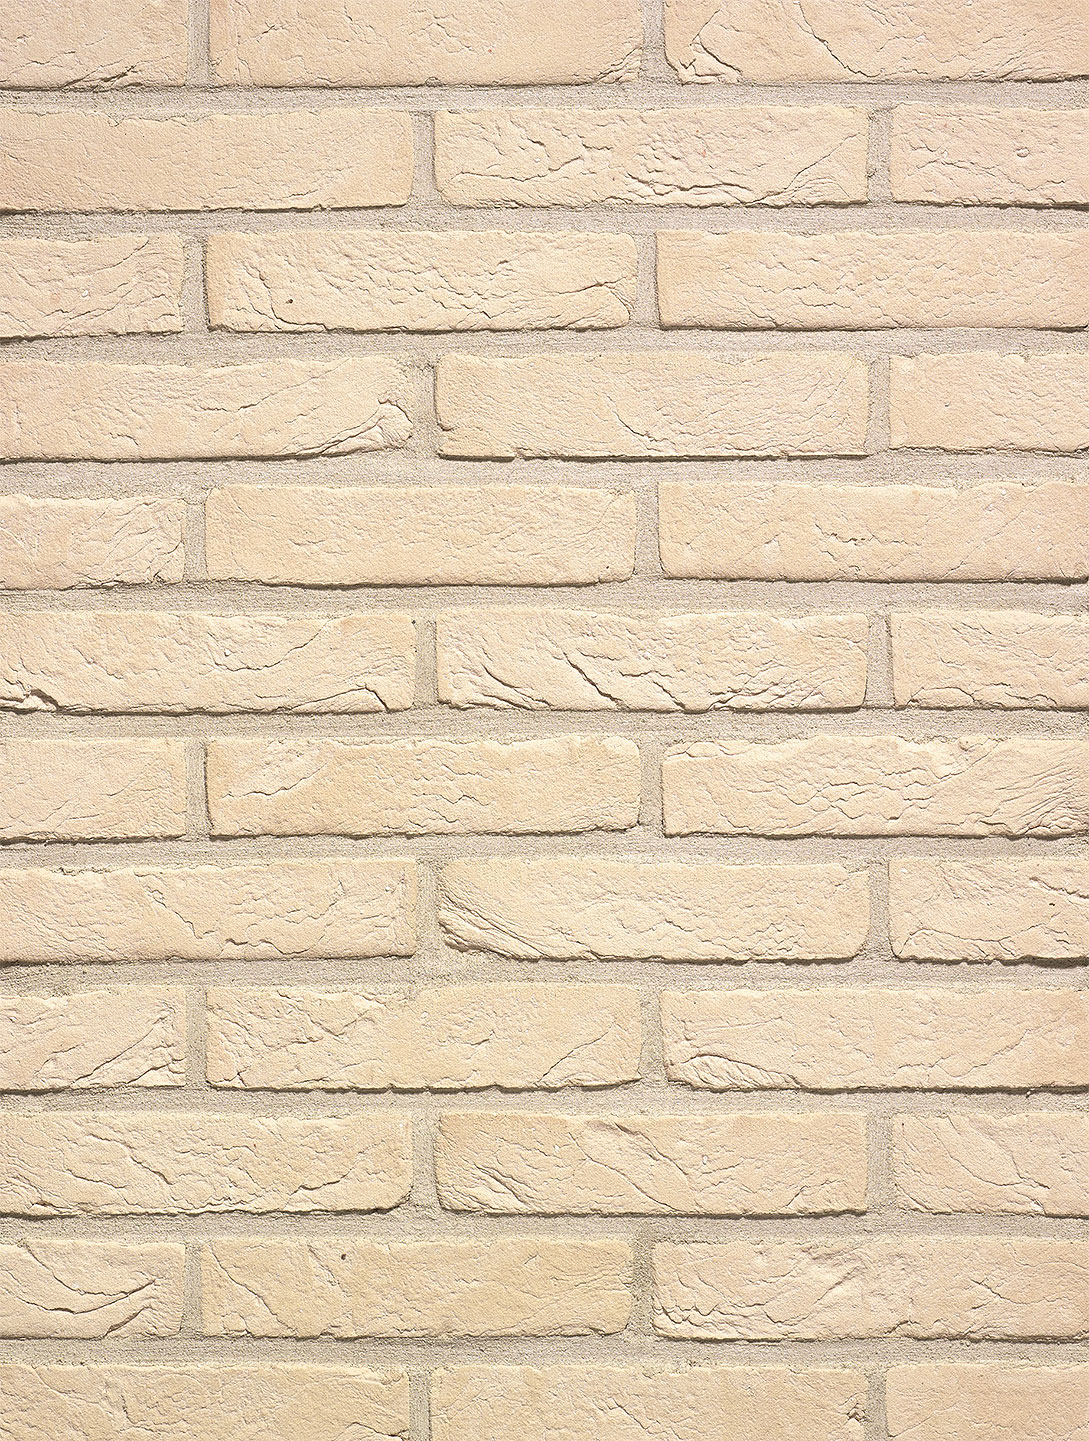 dital-soluciones-wienerberger-brick-coleccion-agora-superwit_001